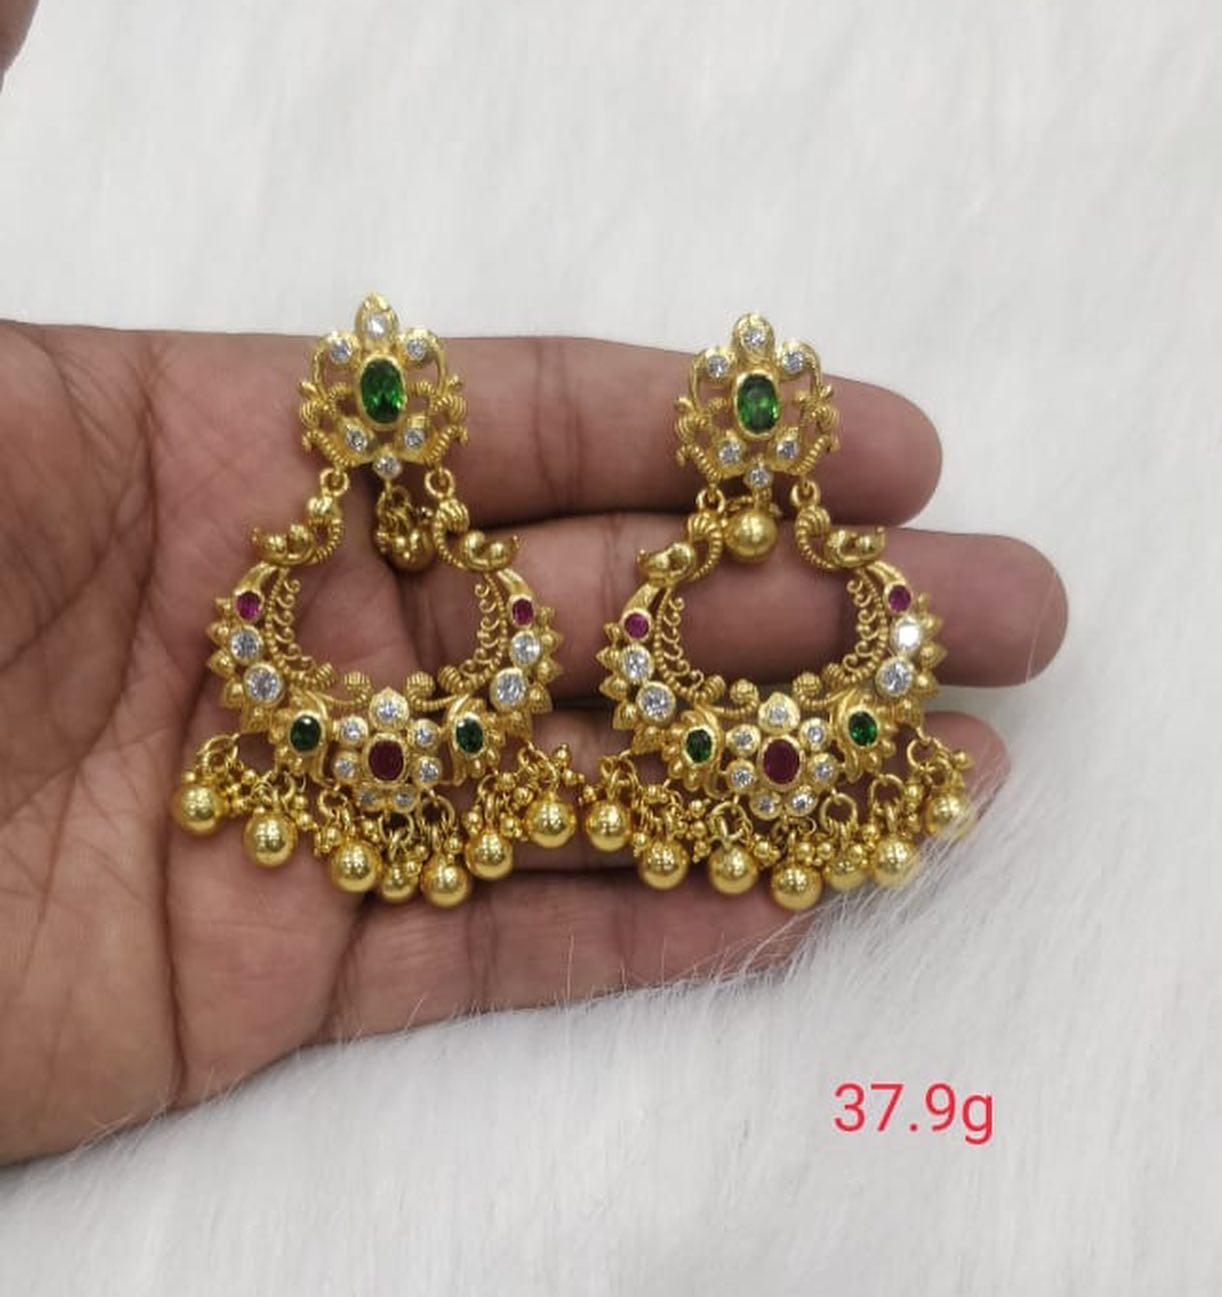 Latest collection of chandbali's & jumkies Shri silver jewellery. Stunning silver chaandbalis with gold polish. 2021-03-20